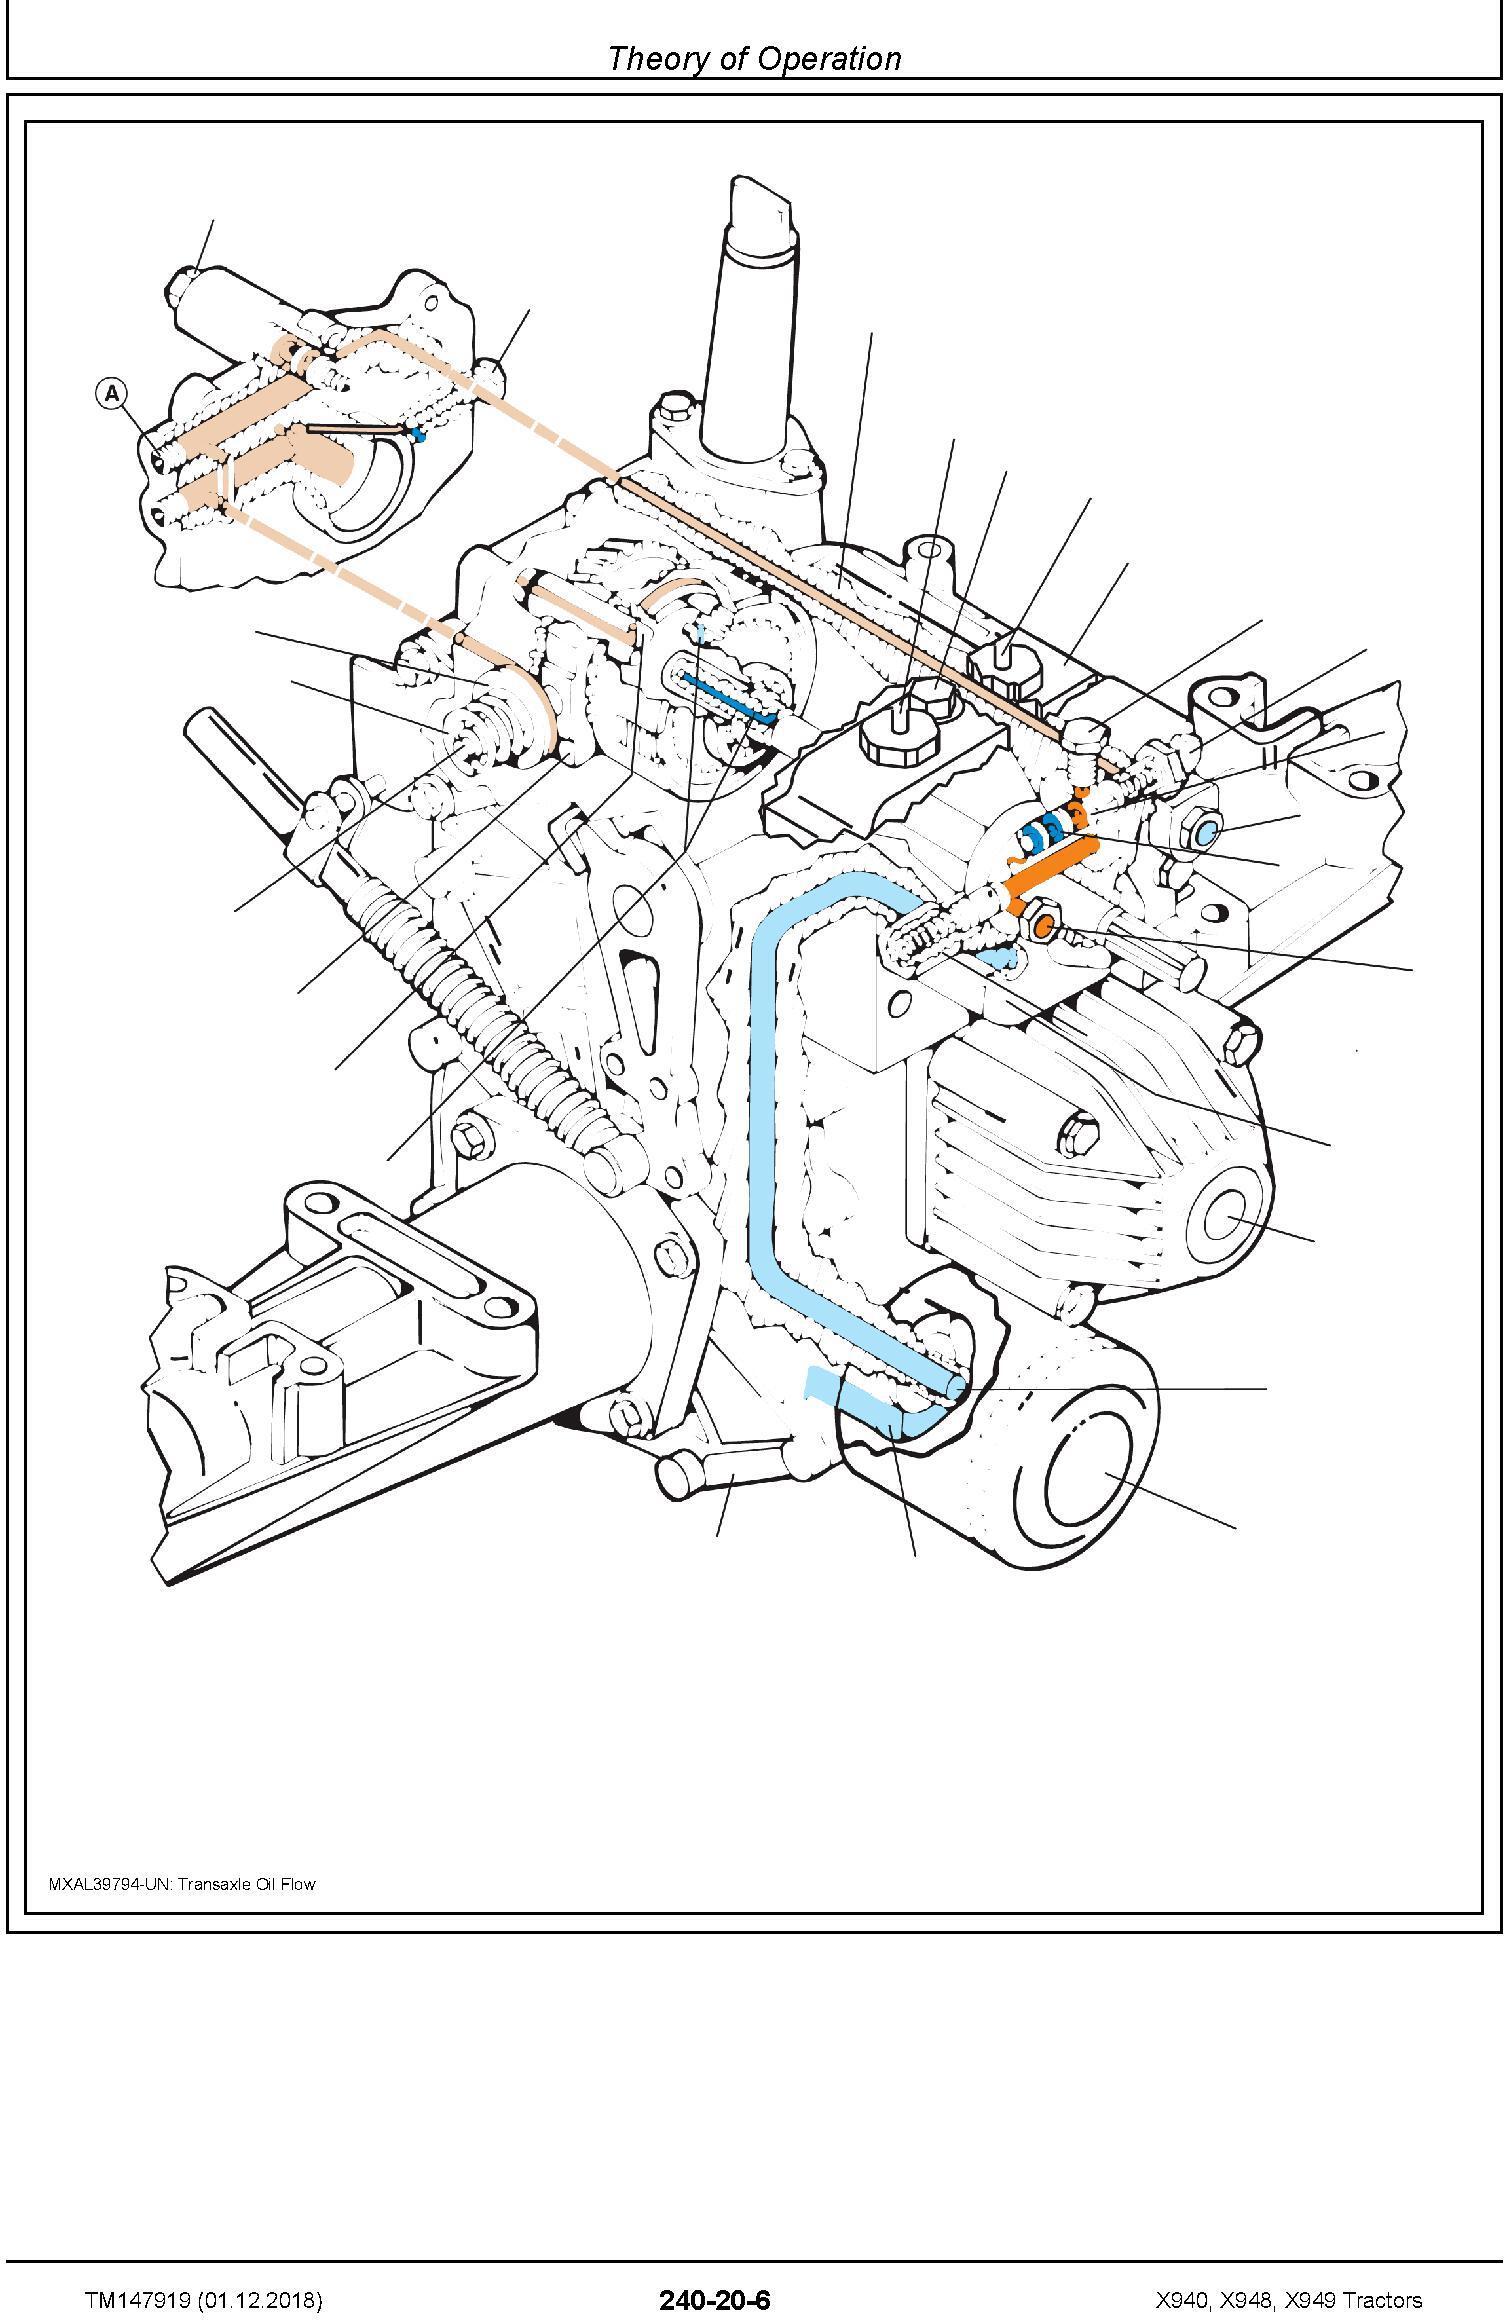 John Deere X940, X948, X949 Compact Utility Tractors (SN. 060001-) Technical Manual (TM147919) - 3